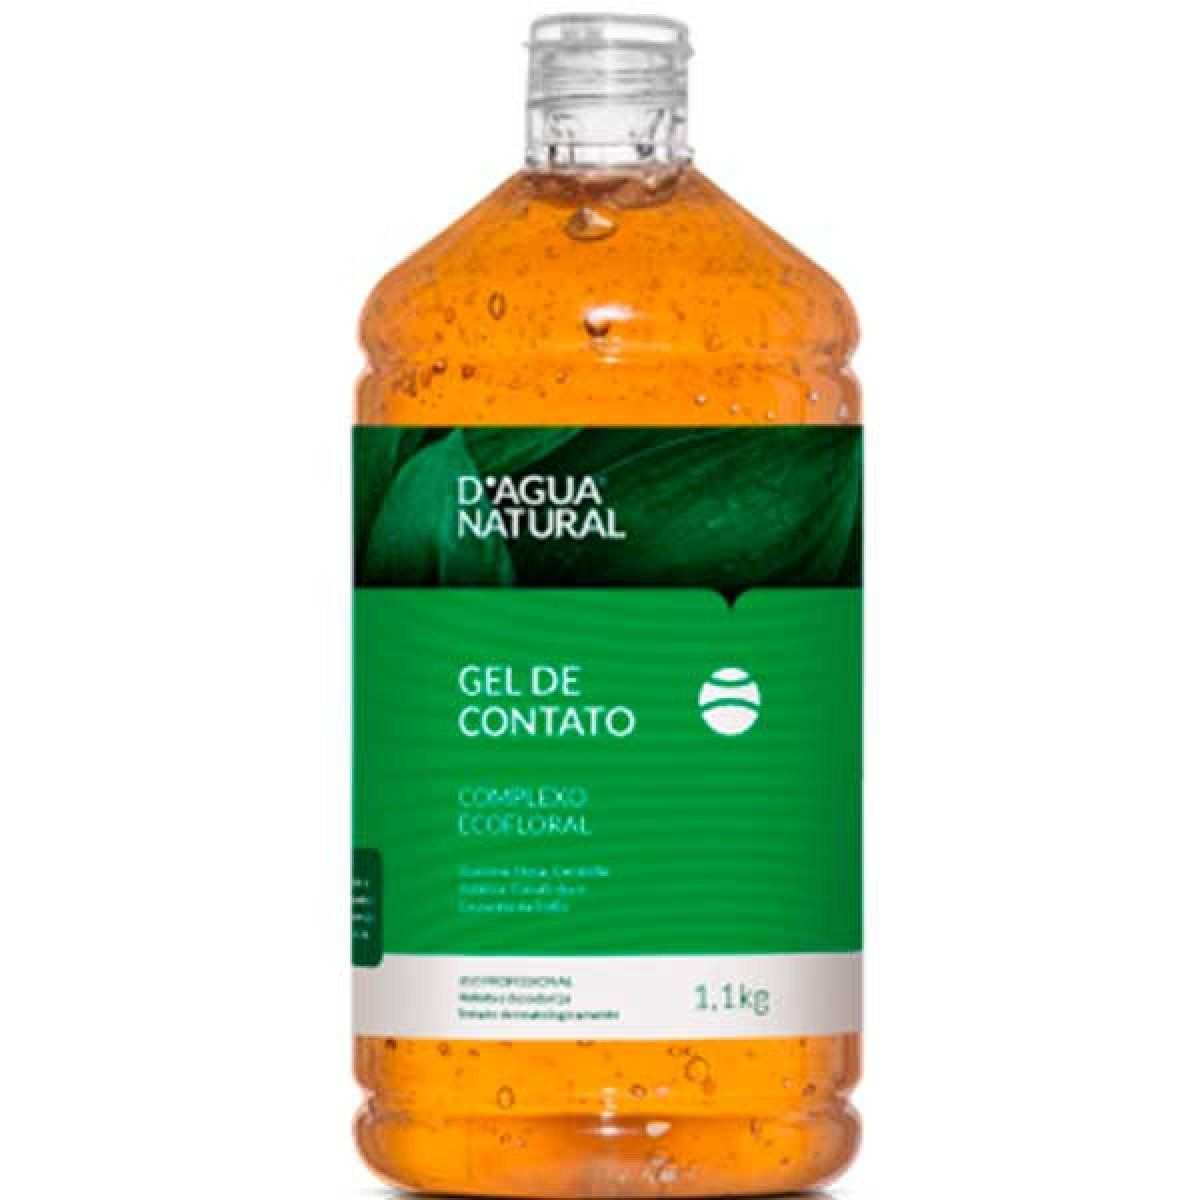 Gel de Contato Ecofloral-D'Agua natural